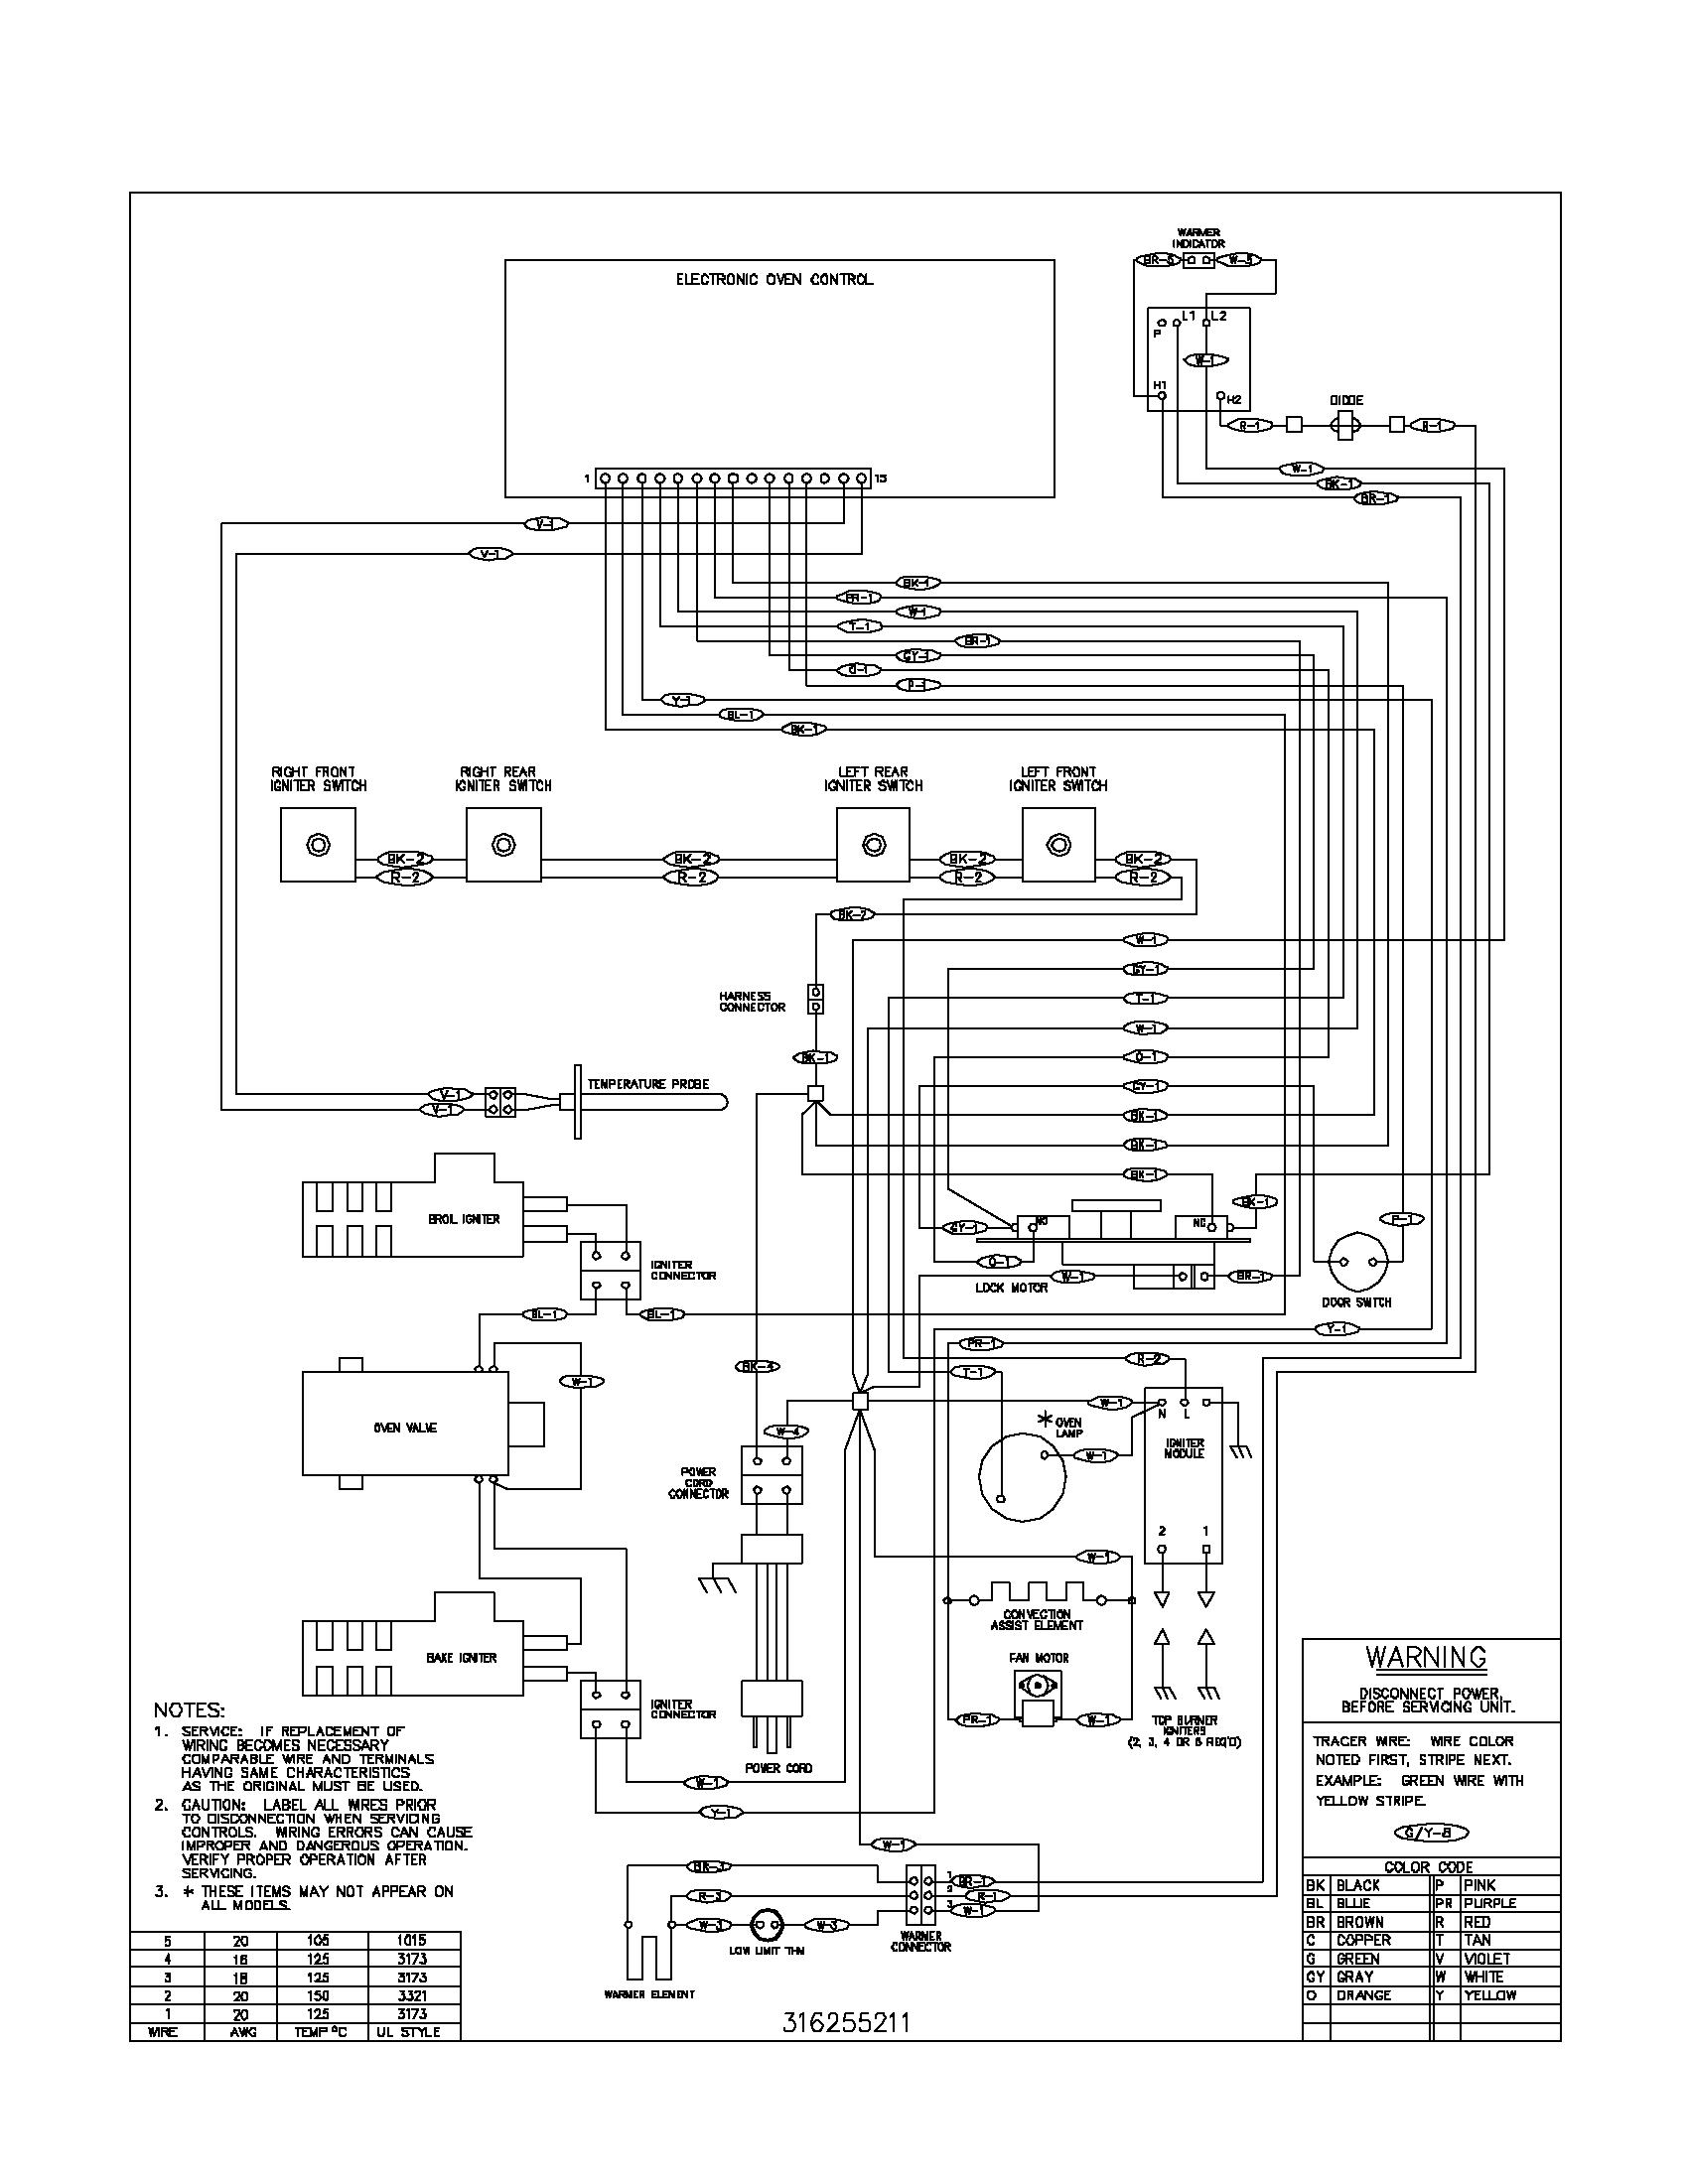 Kubota L2900 Wiring Diagram Gallery Diagram Writing Sample And Guide – L3200 Kubota Wiring Diagram